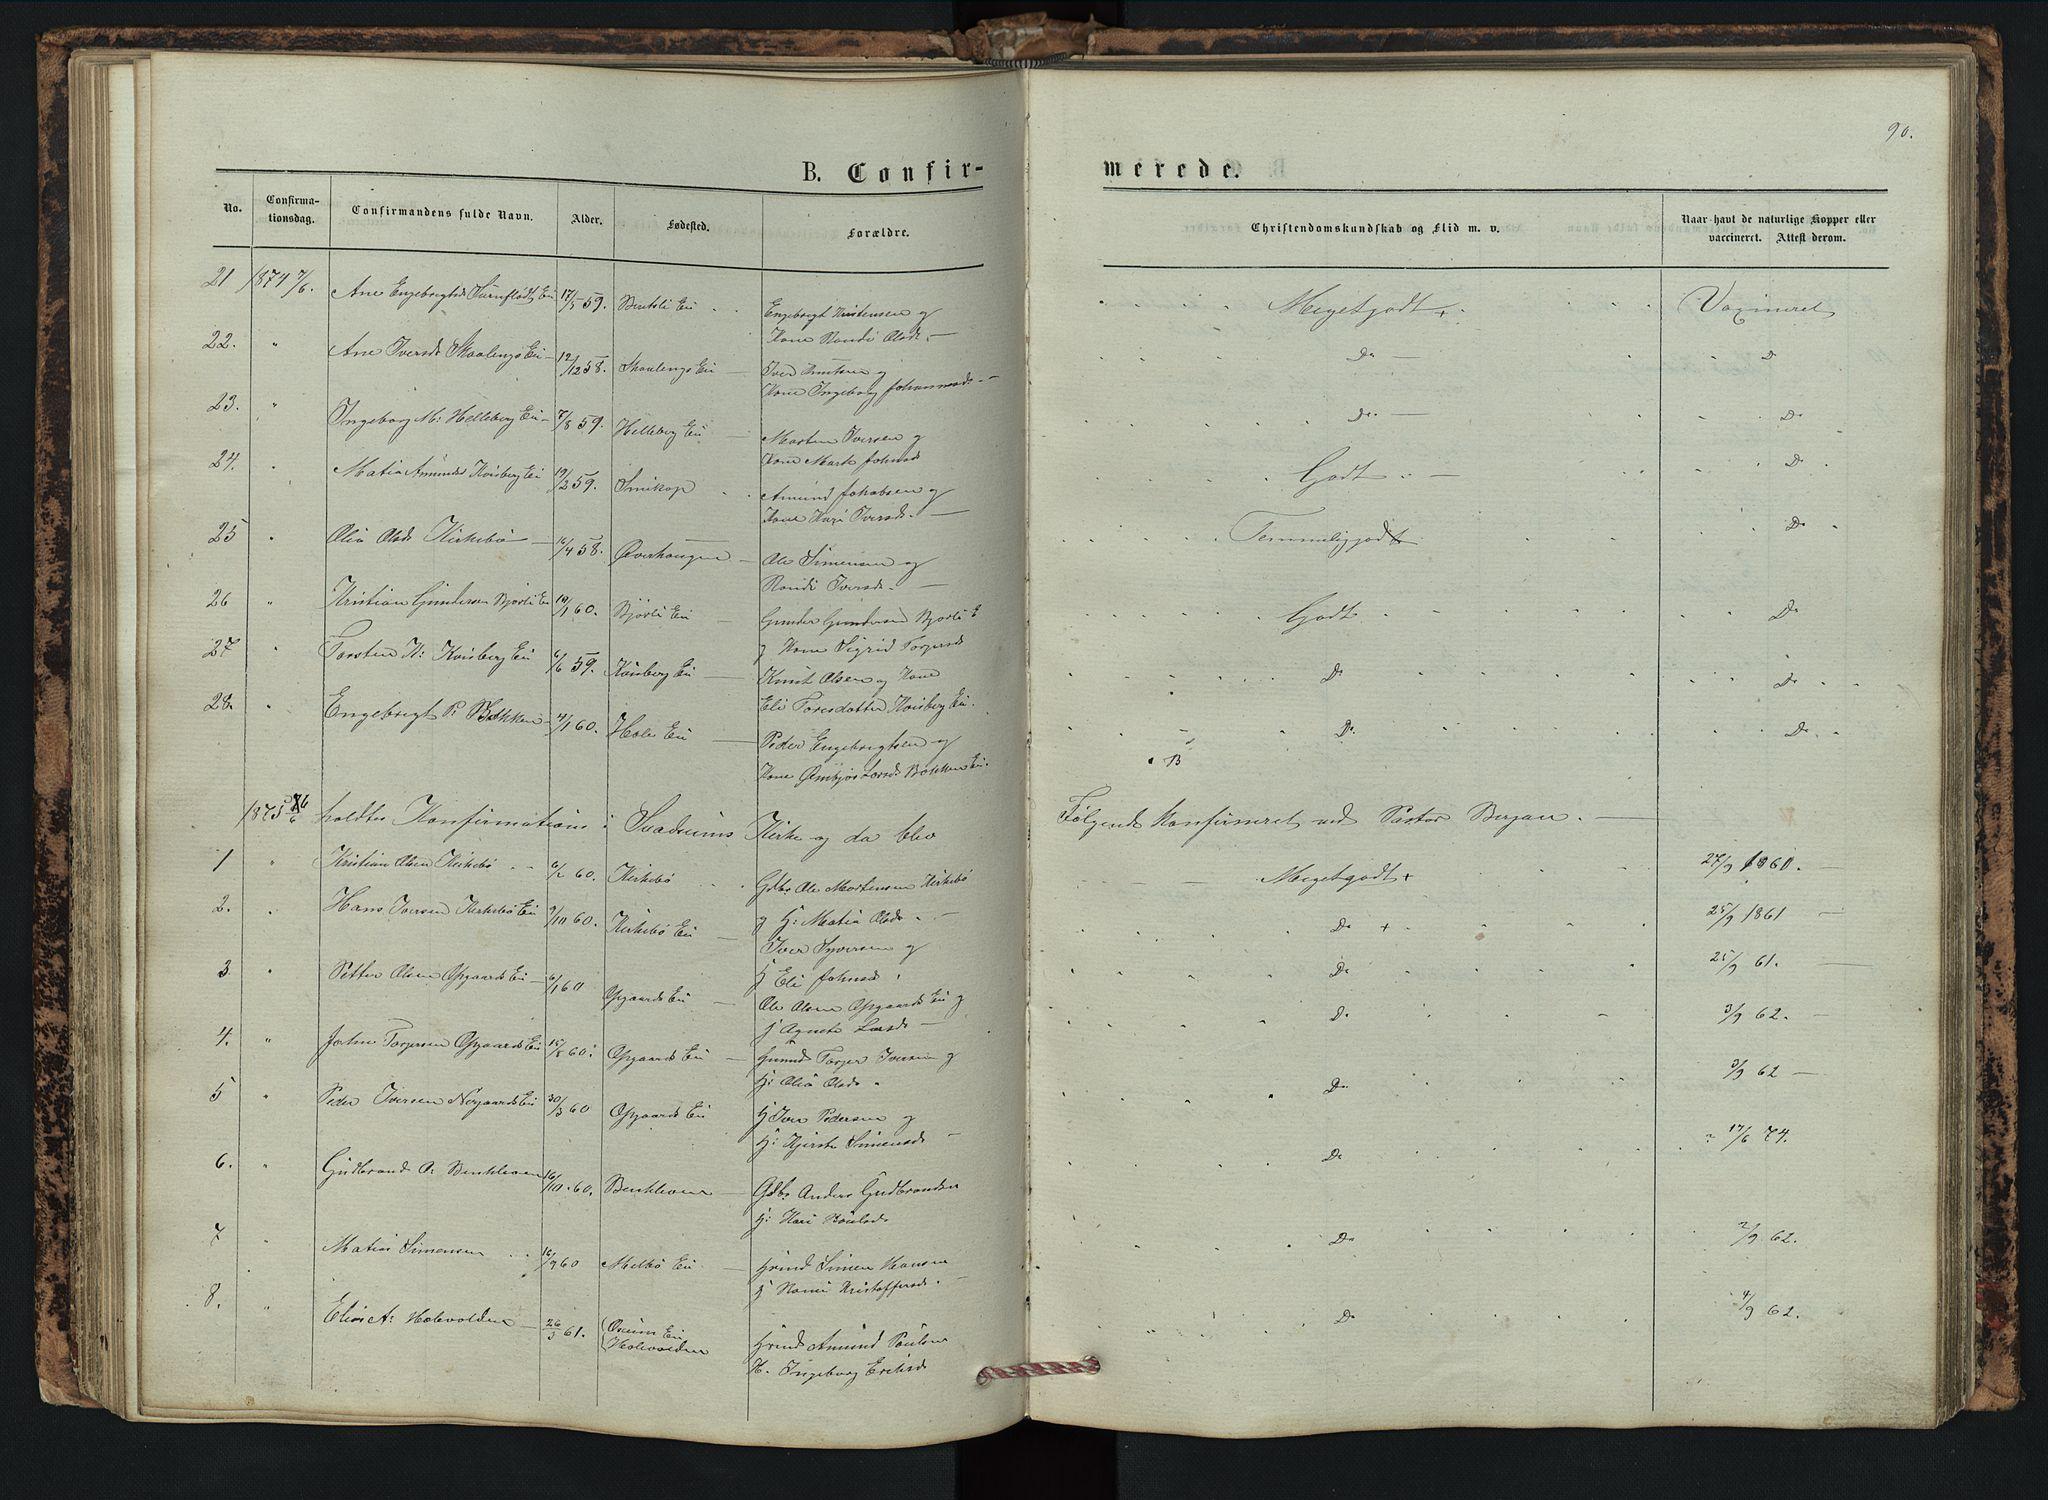 SAH, Vestre Gausdal prestekontor, Klokkerbok nr. 2, 1874-1897, s. 90